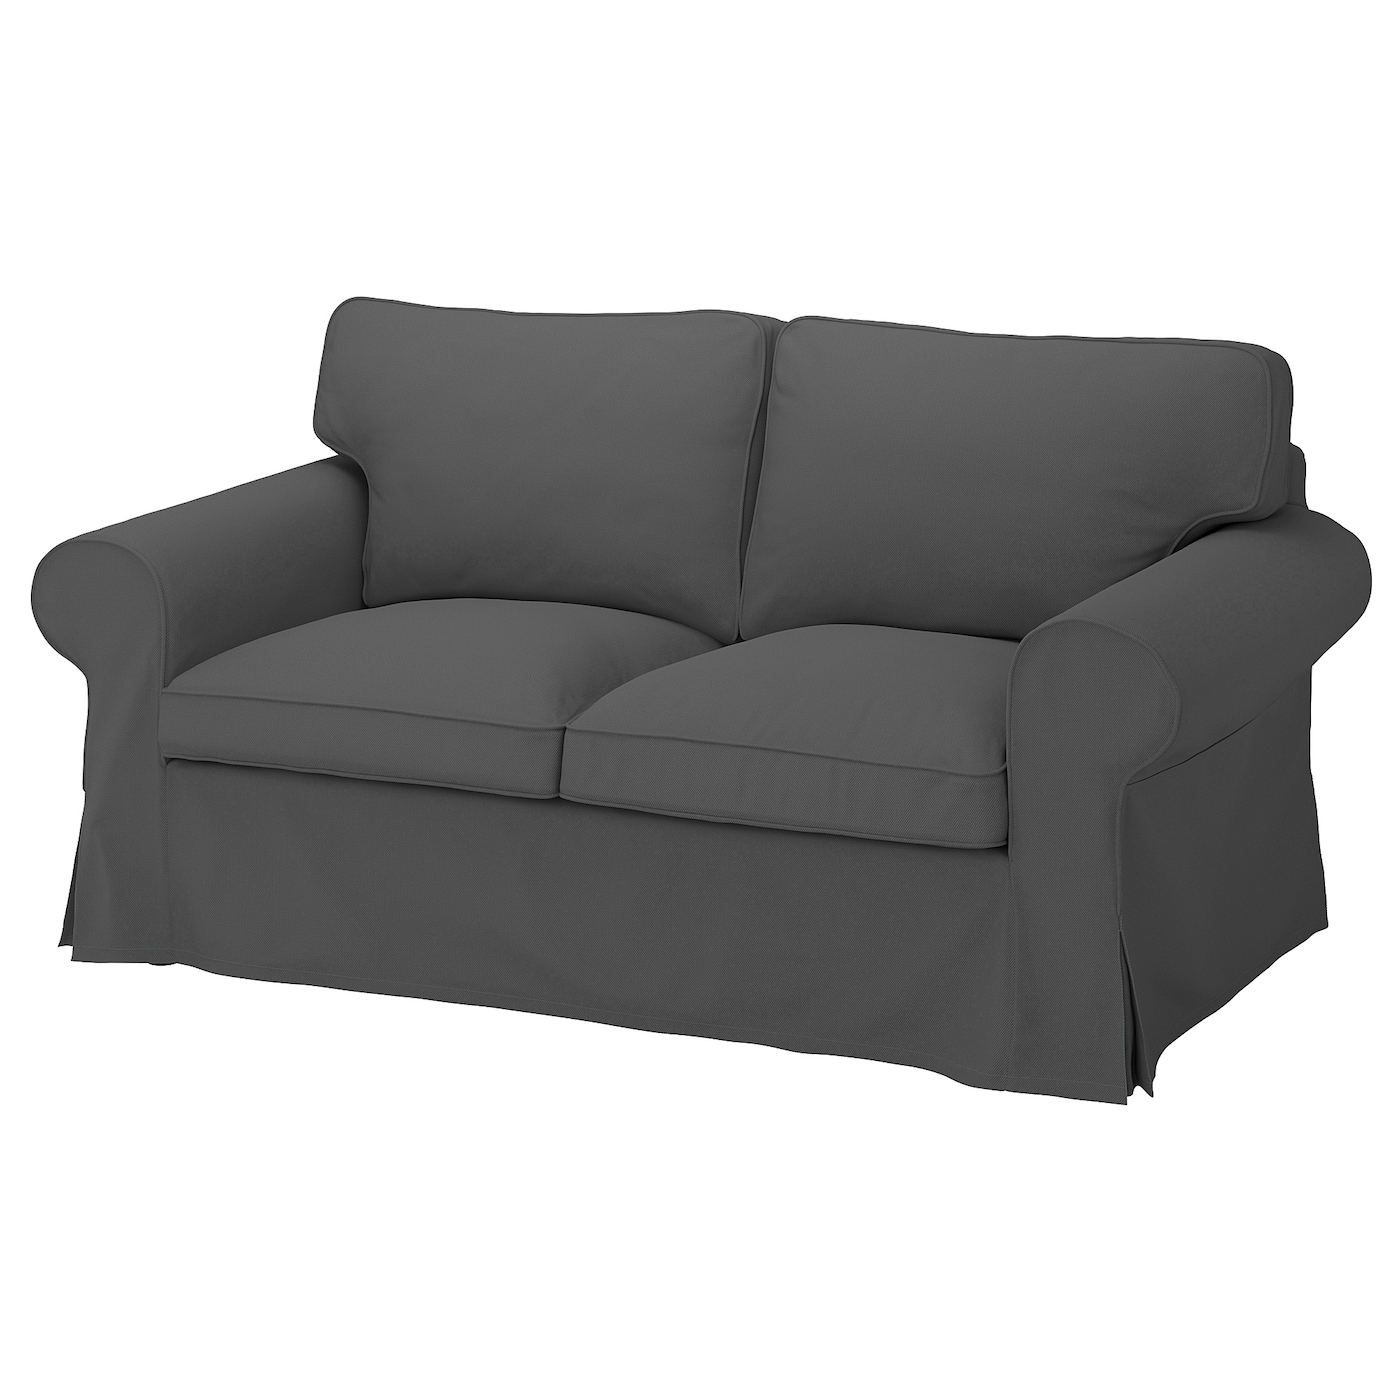 EKTORP Sofá 2 plazas - Hallarp gris - IKEA